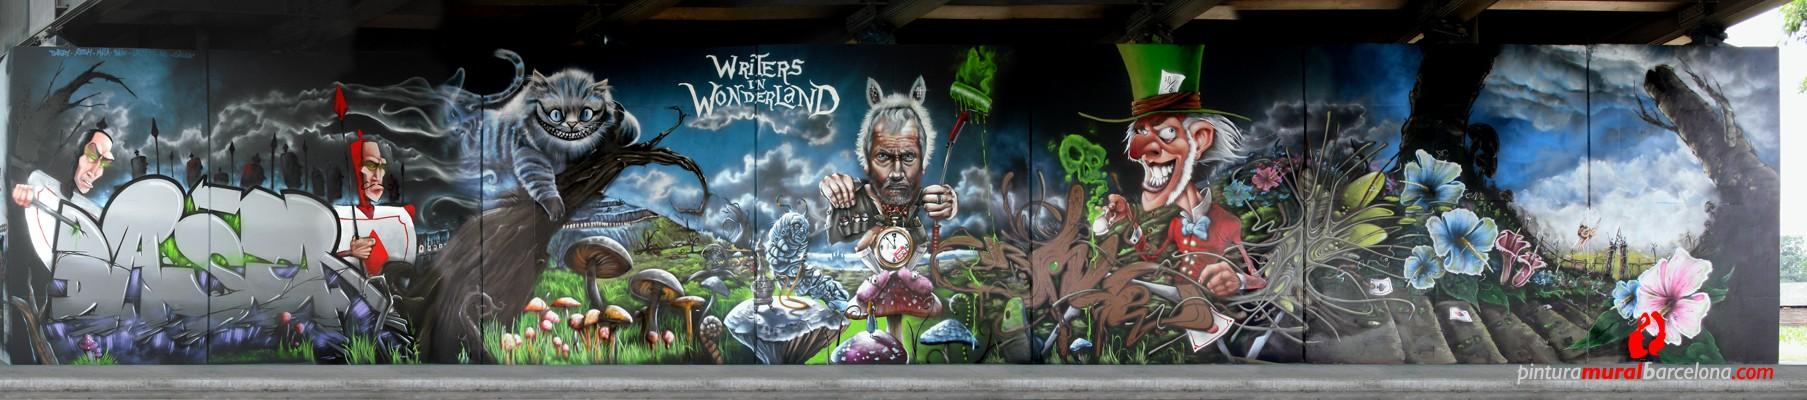 gran-mural-graffiti-petados-bocholt-belgica